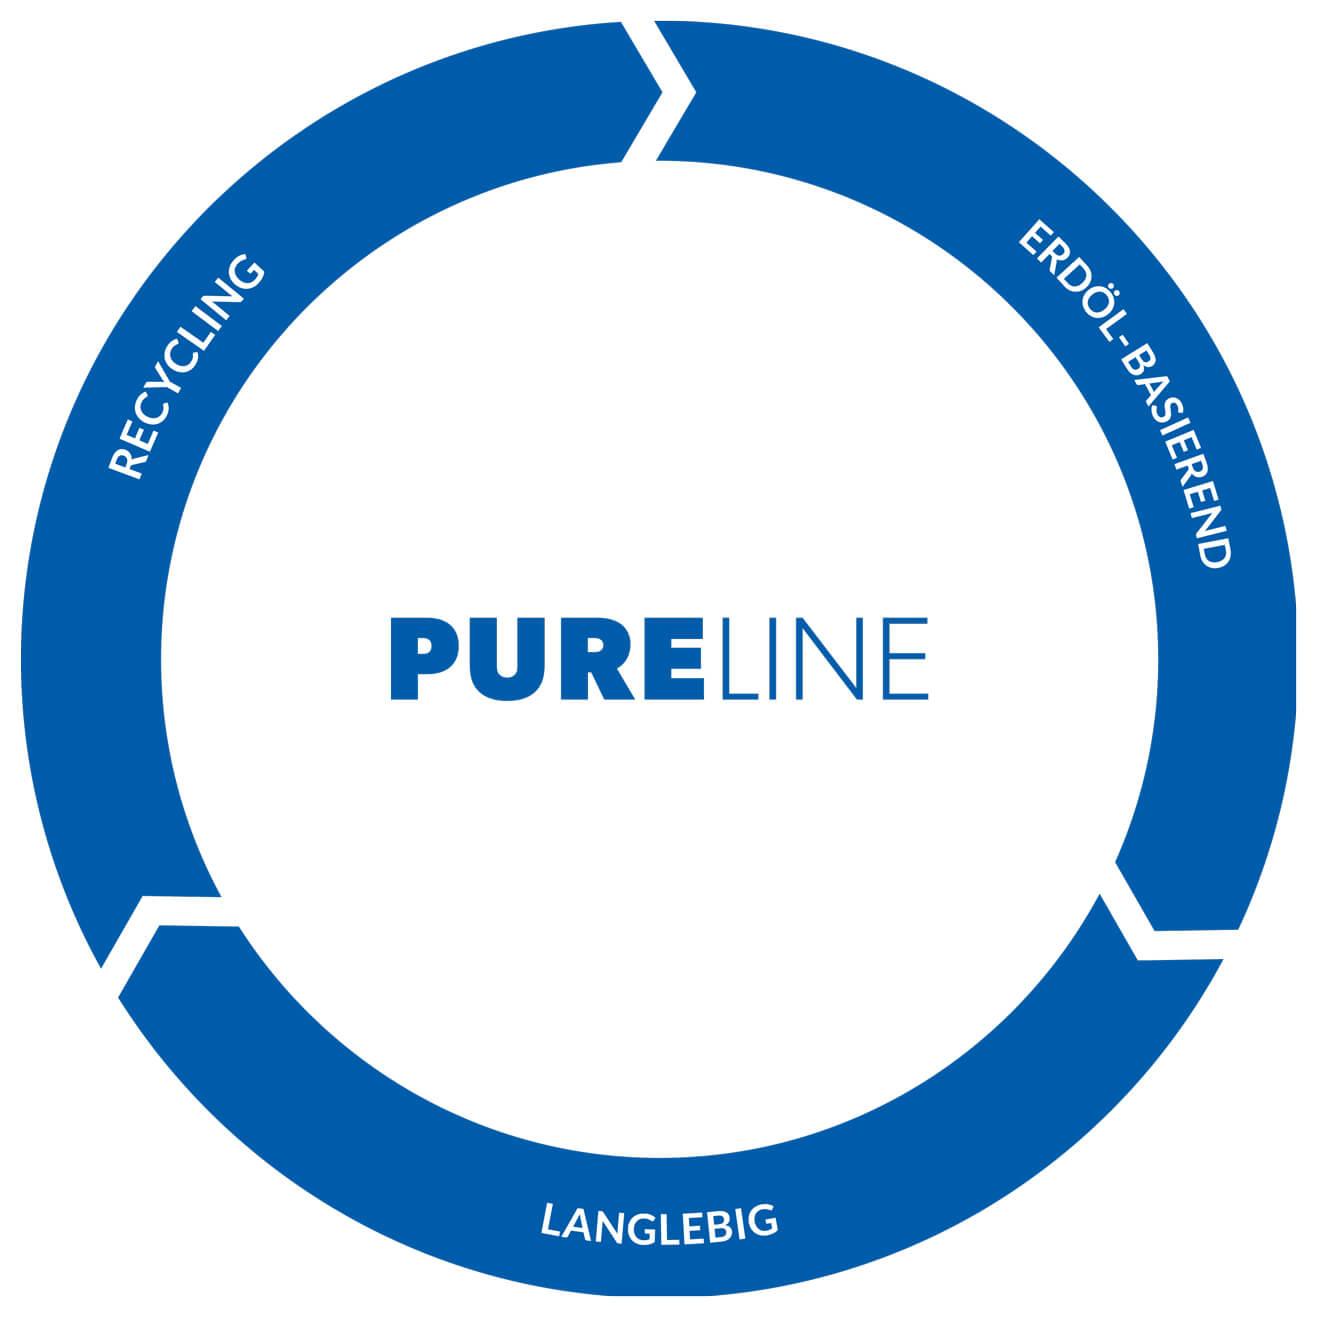 PURELINE Kreislauf - PURELINE Circulation